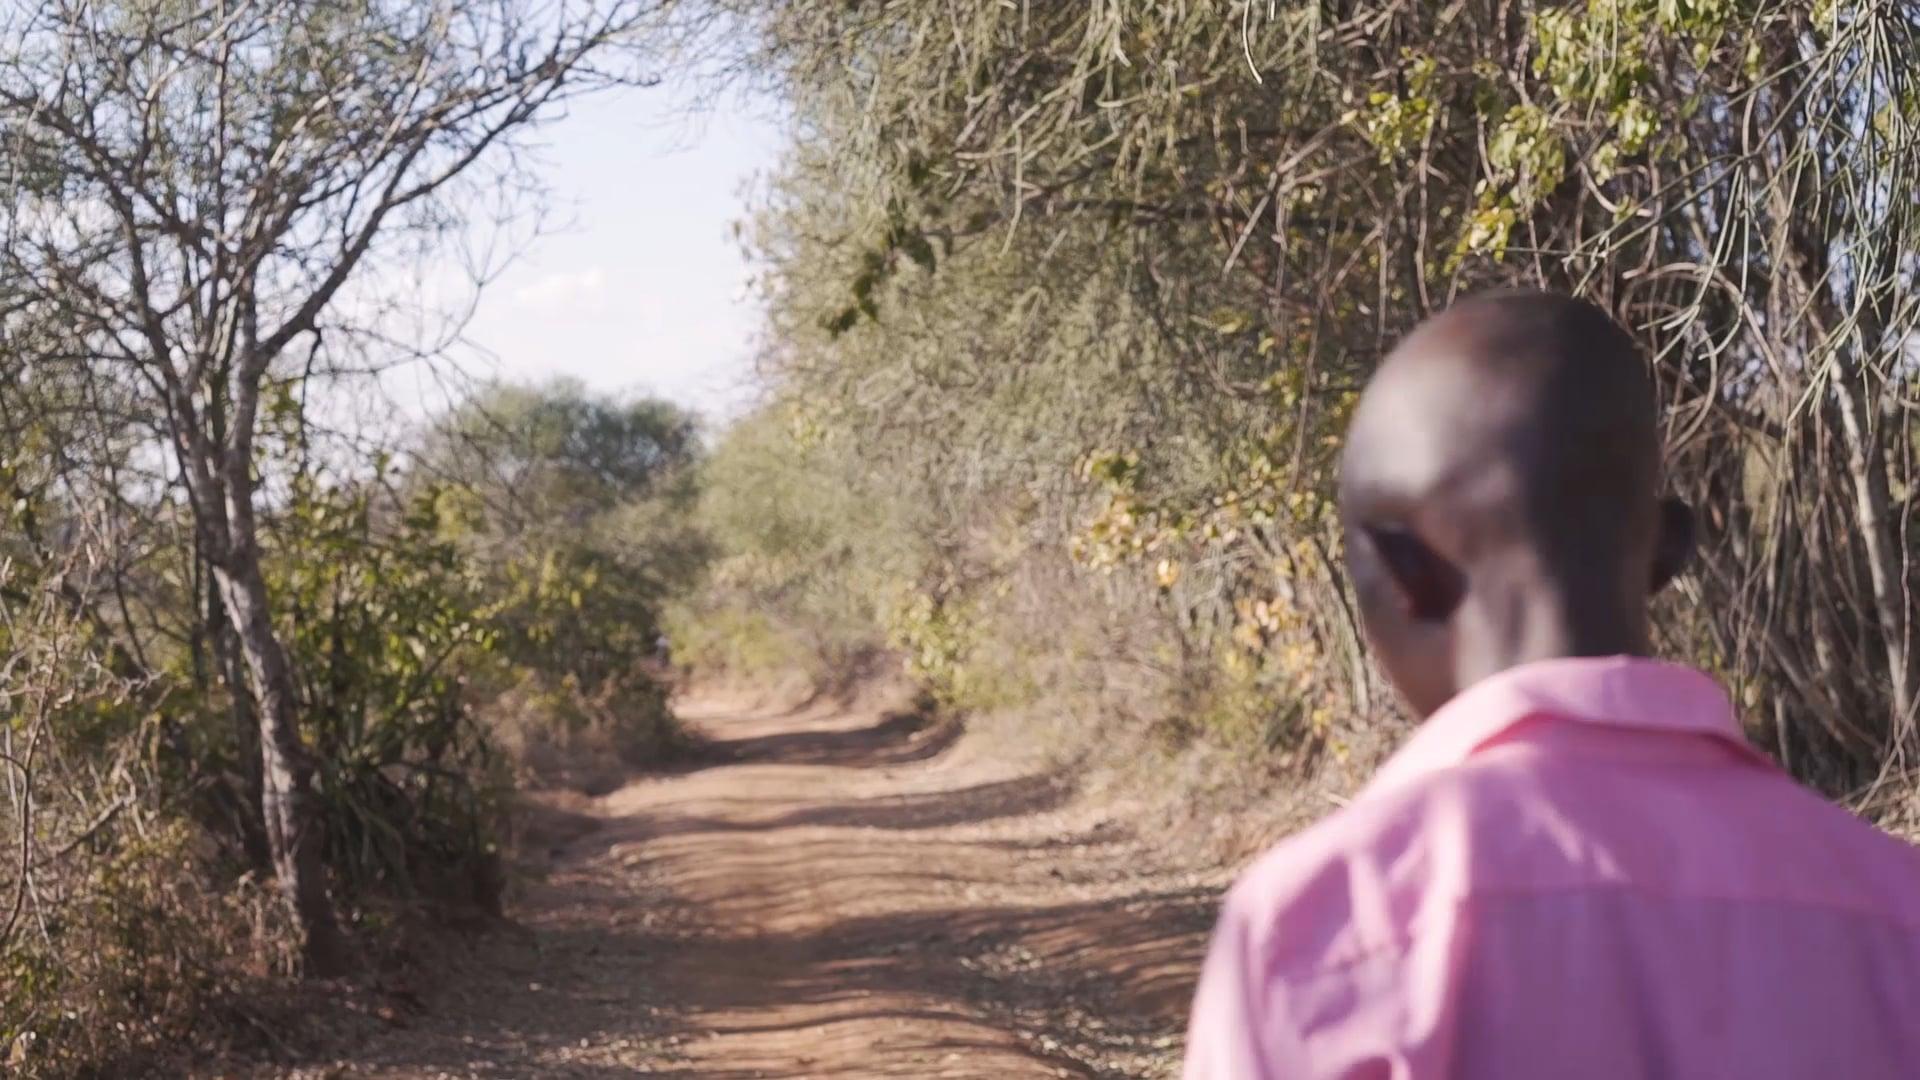 03 Kenia - Educated for Life voice over Joshua-finalv1